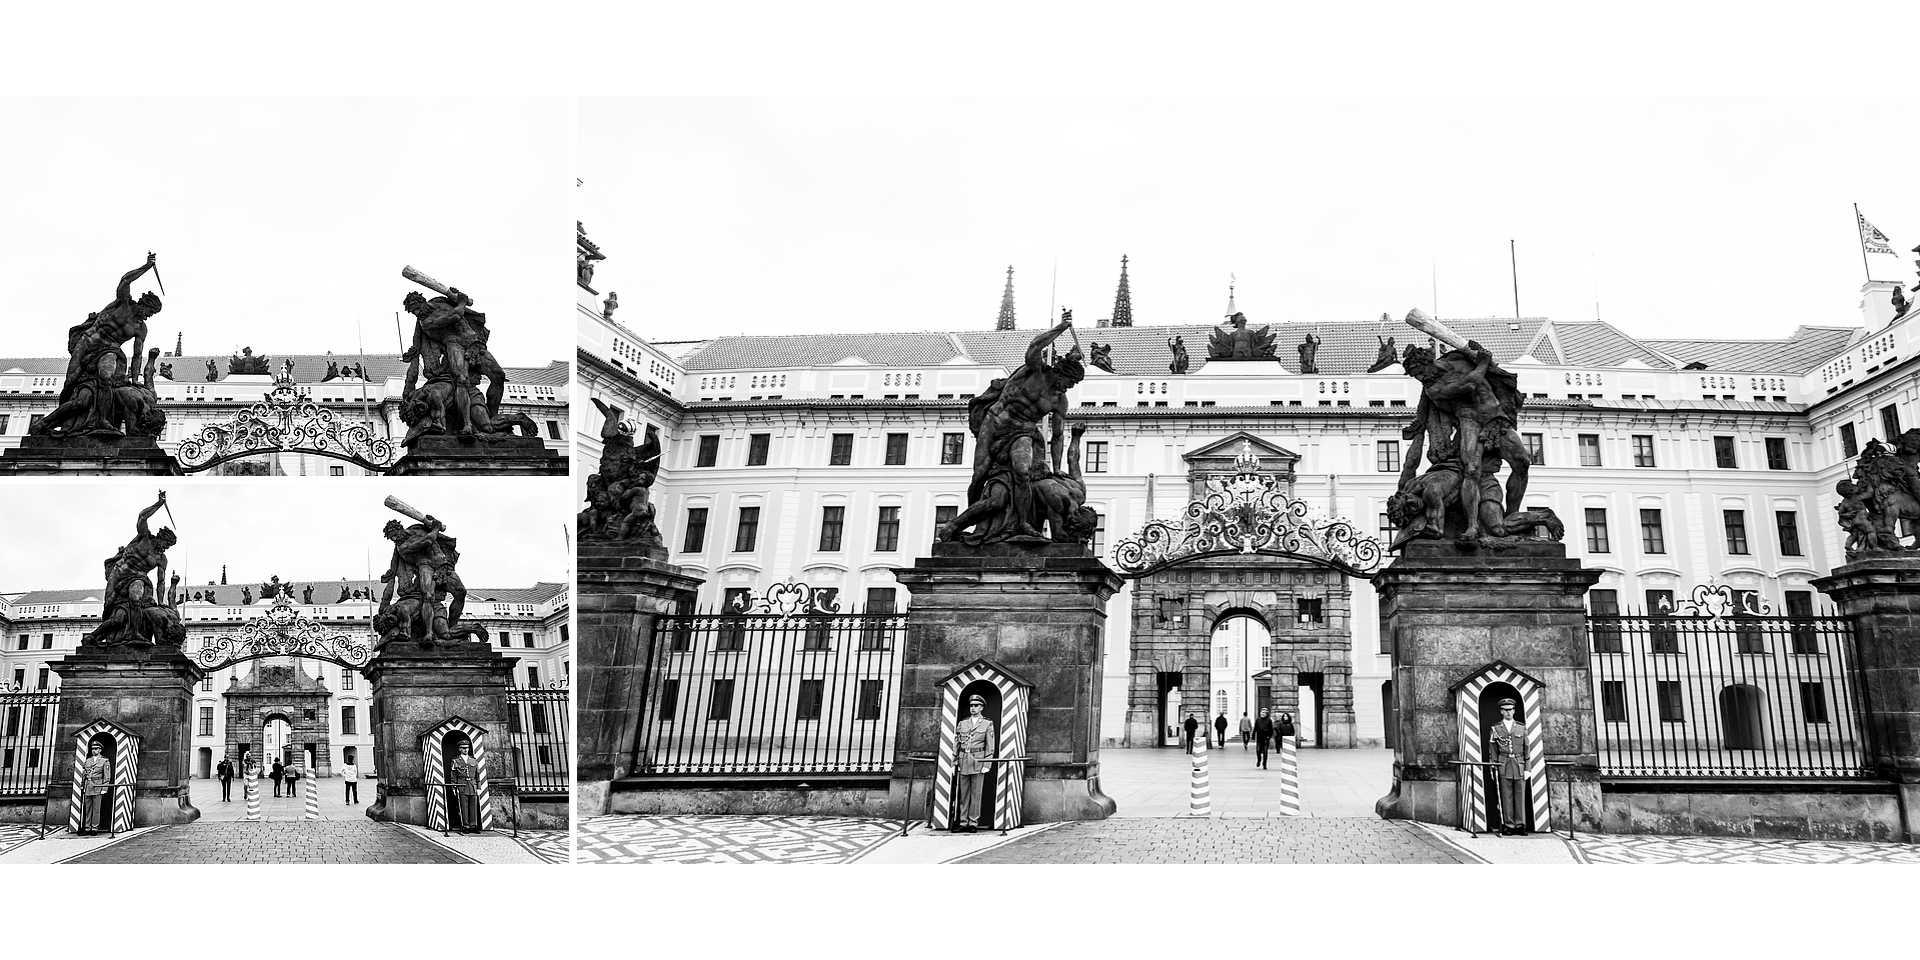 Live your Life - descubre Praga - Pražský hrad